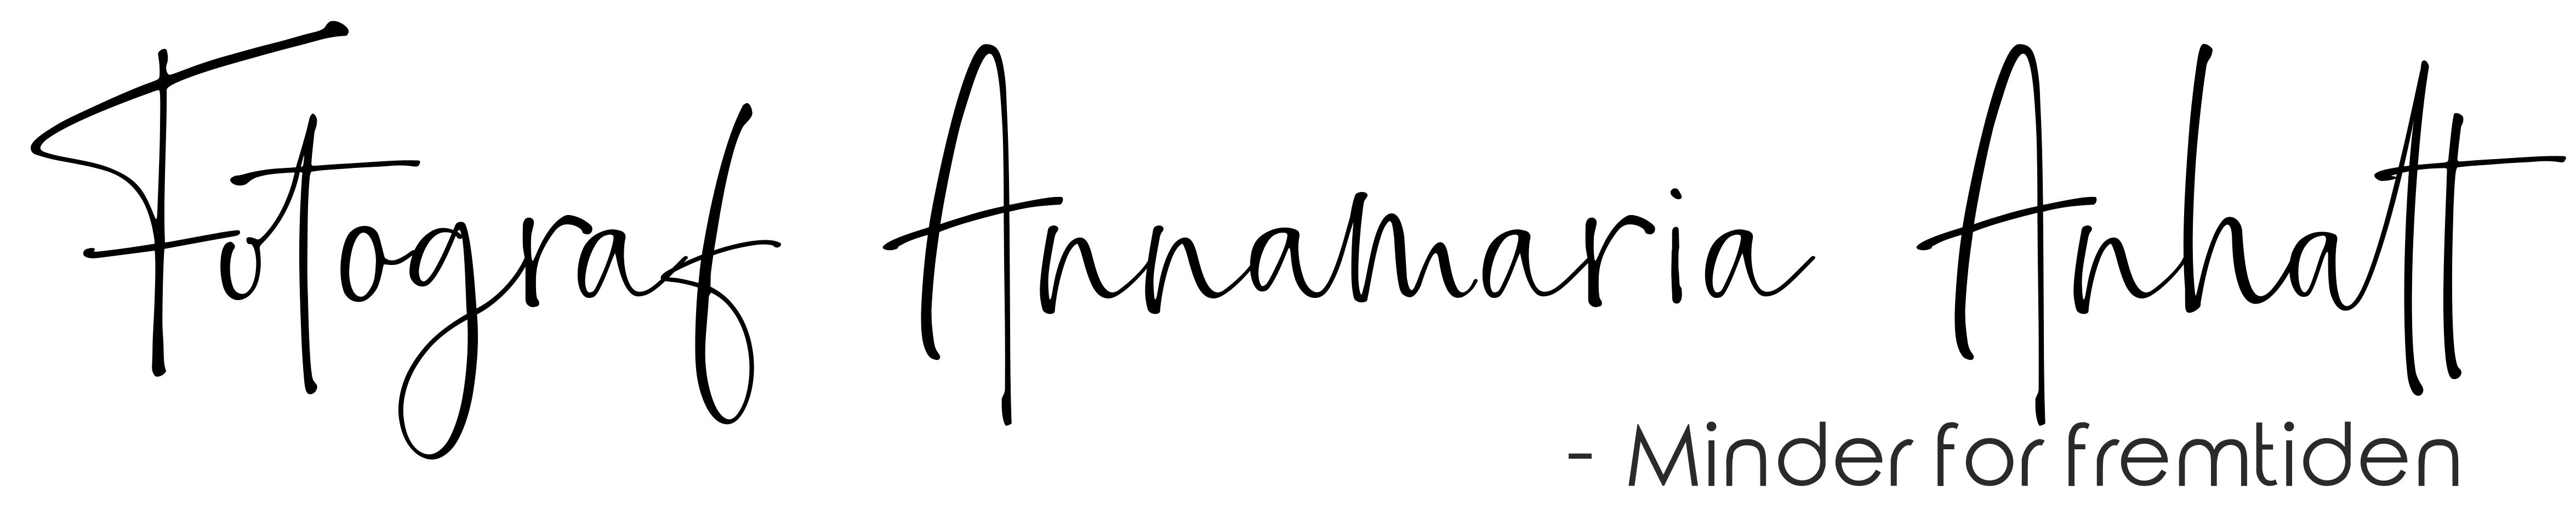 Annamaria Anhalt